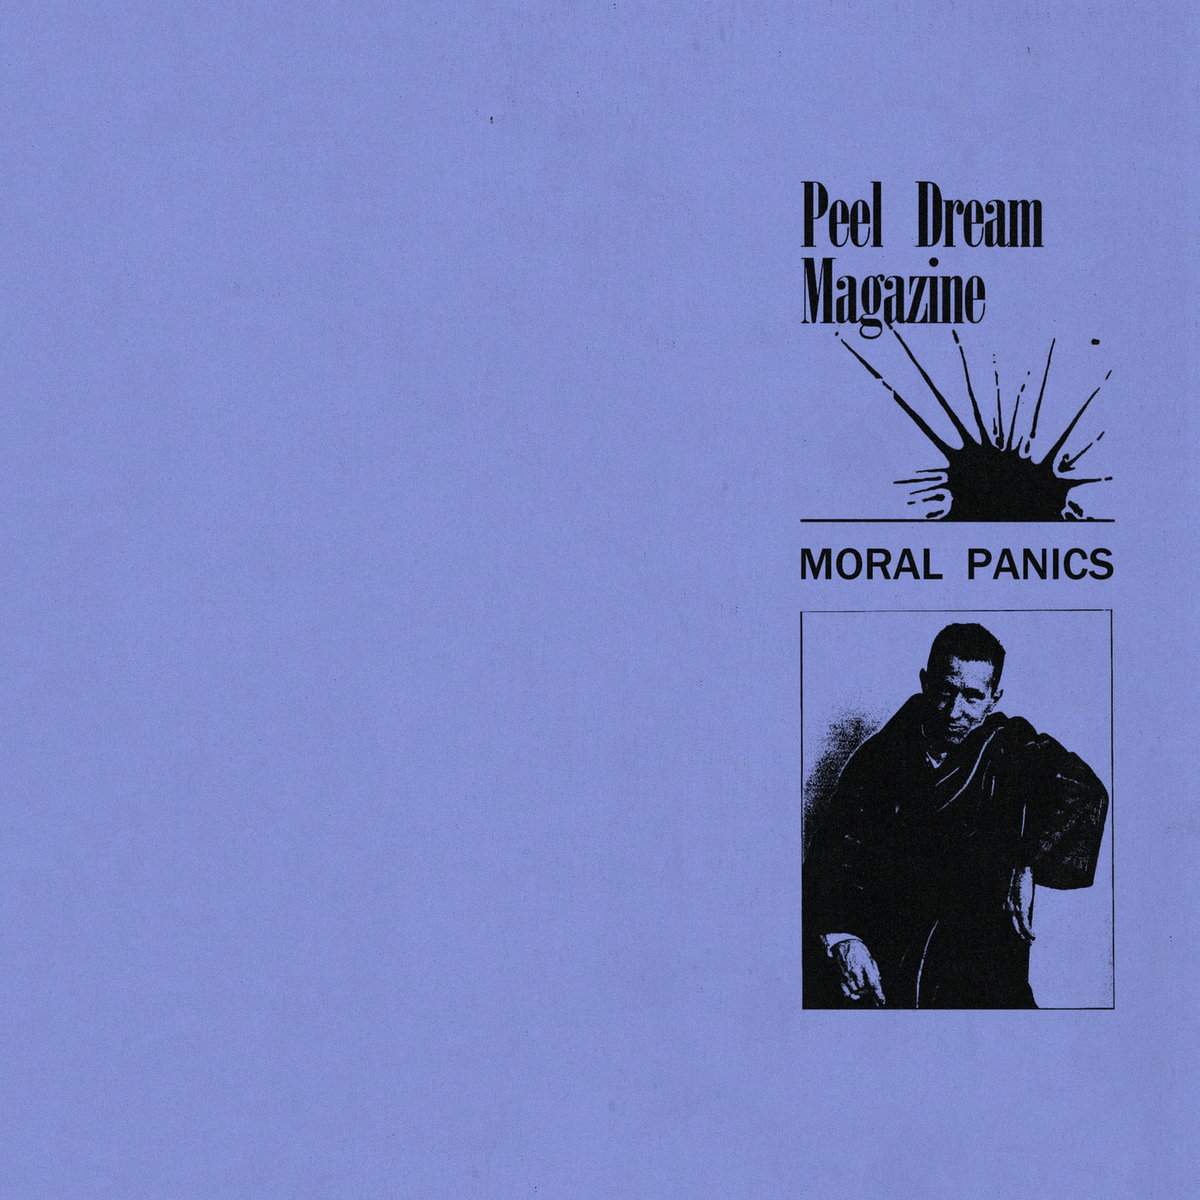 Moral Panics | Peel Dream Magazine